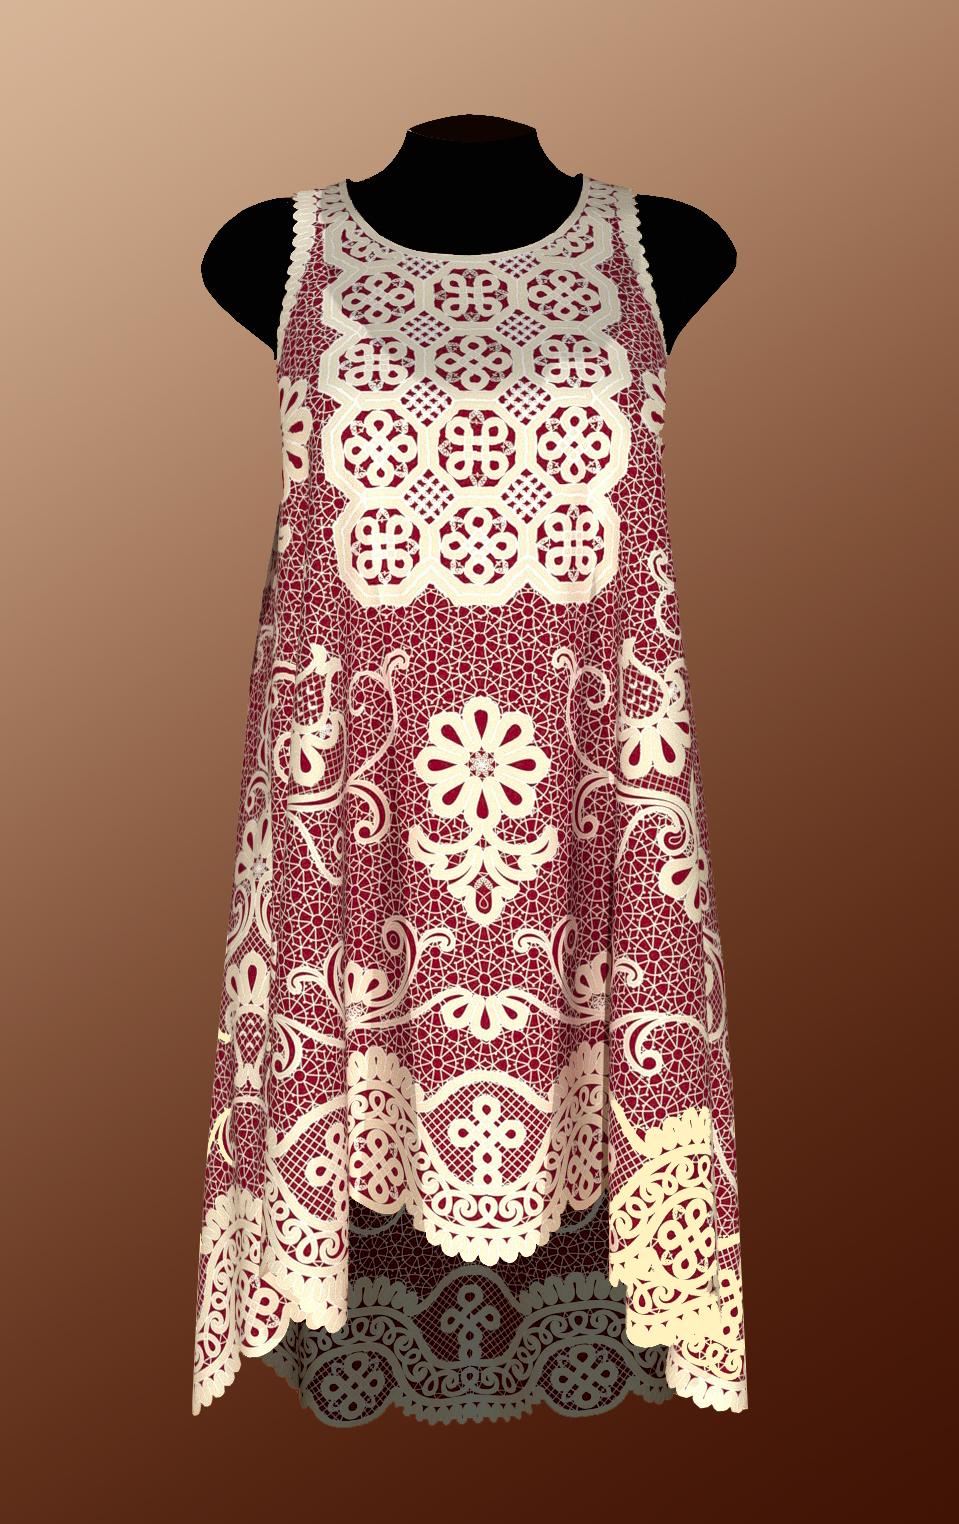 Сколок — Платье-туника. группа № 3 размеры: 58, 60, 62